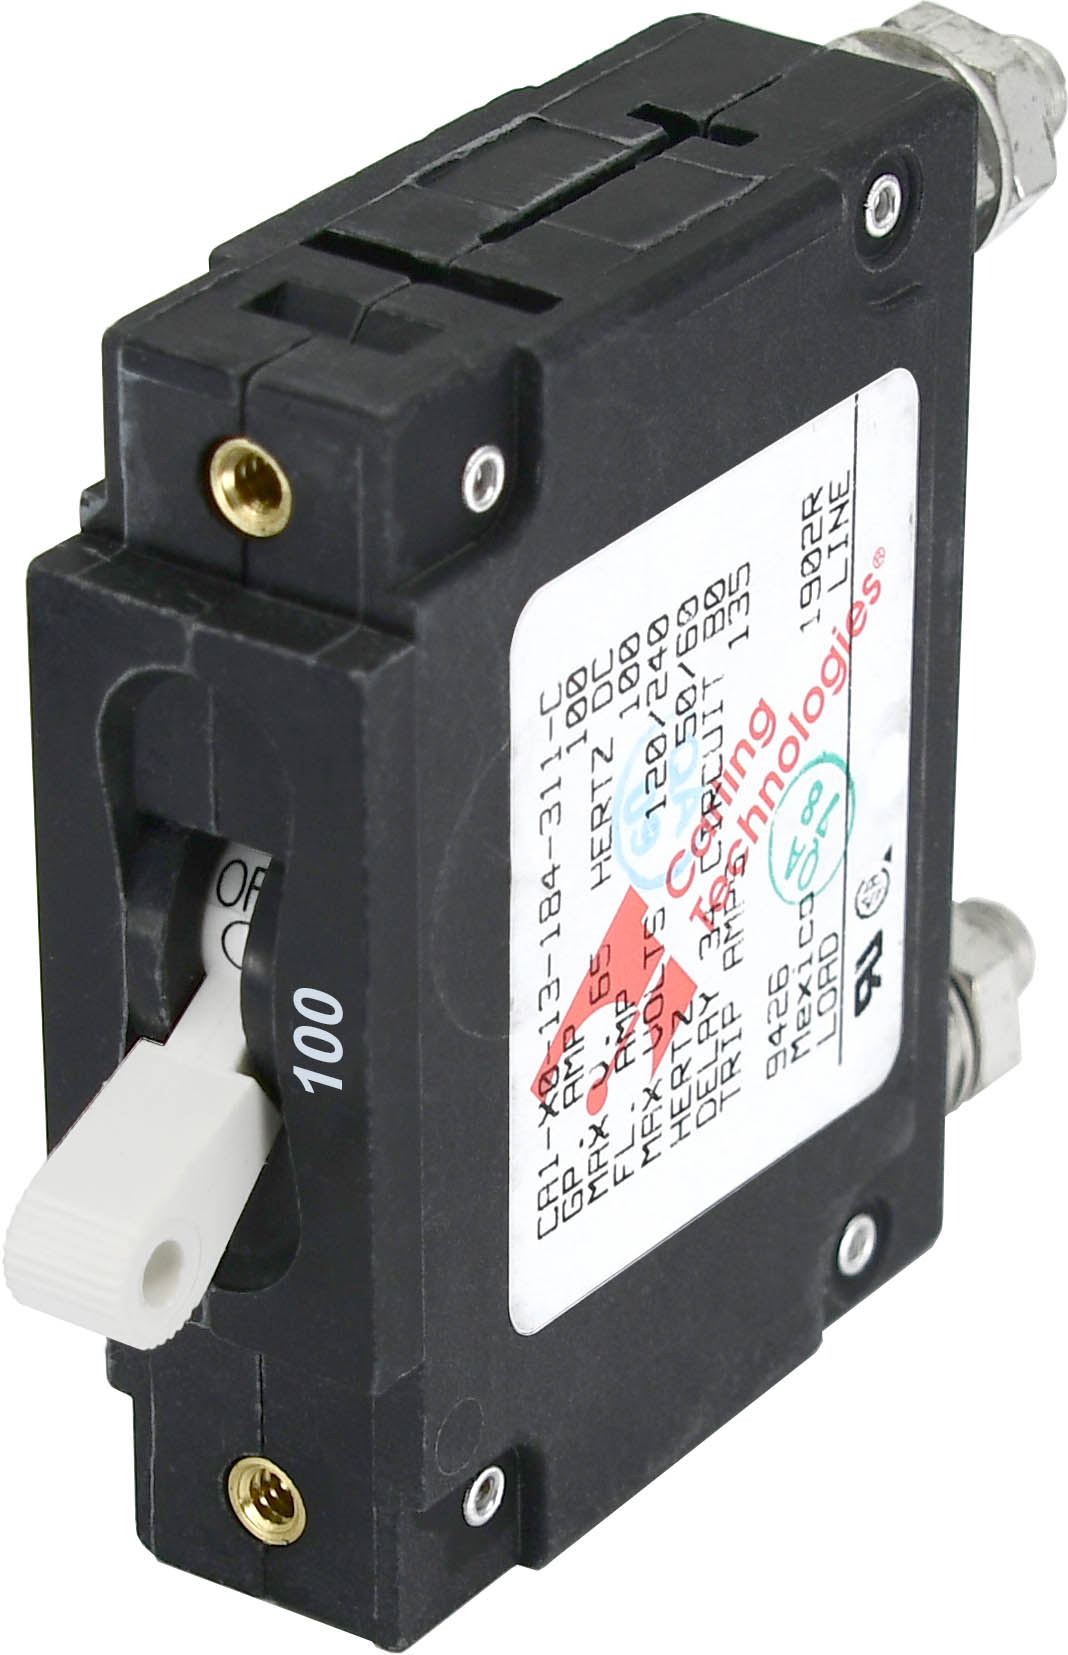 C-Series White Toggle Circuit Breaker - Single Pole 100 Amp - Blue ...